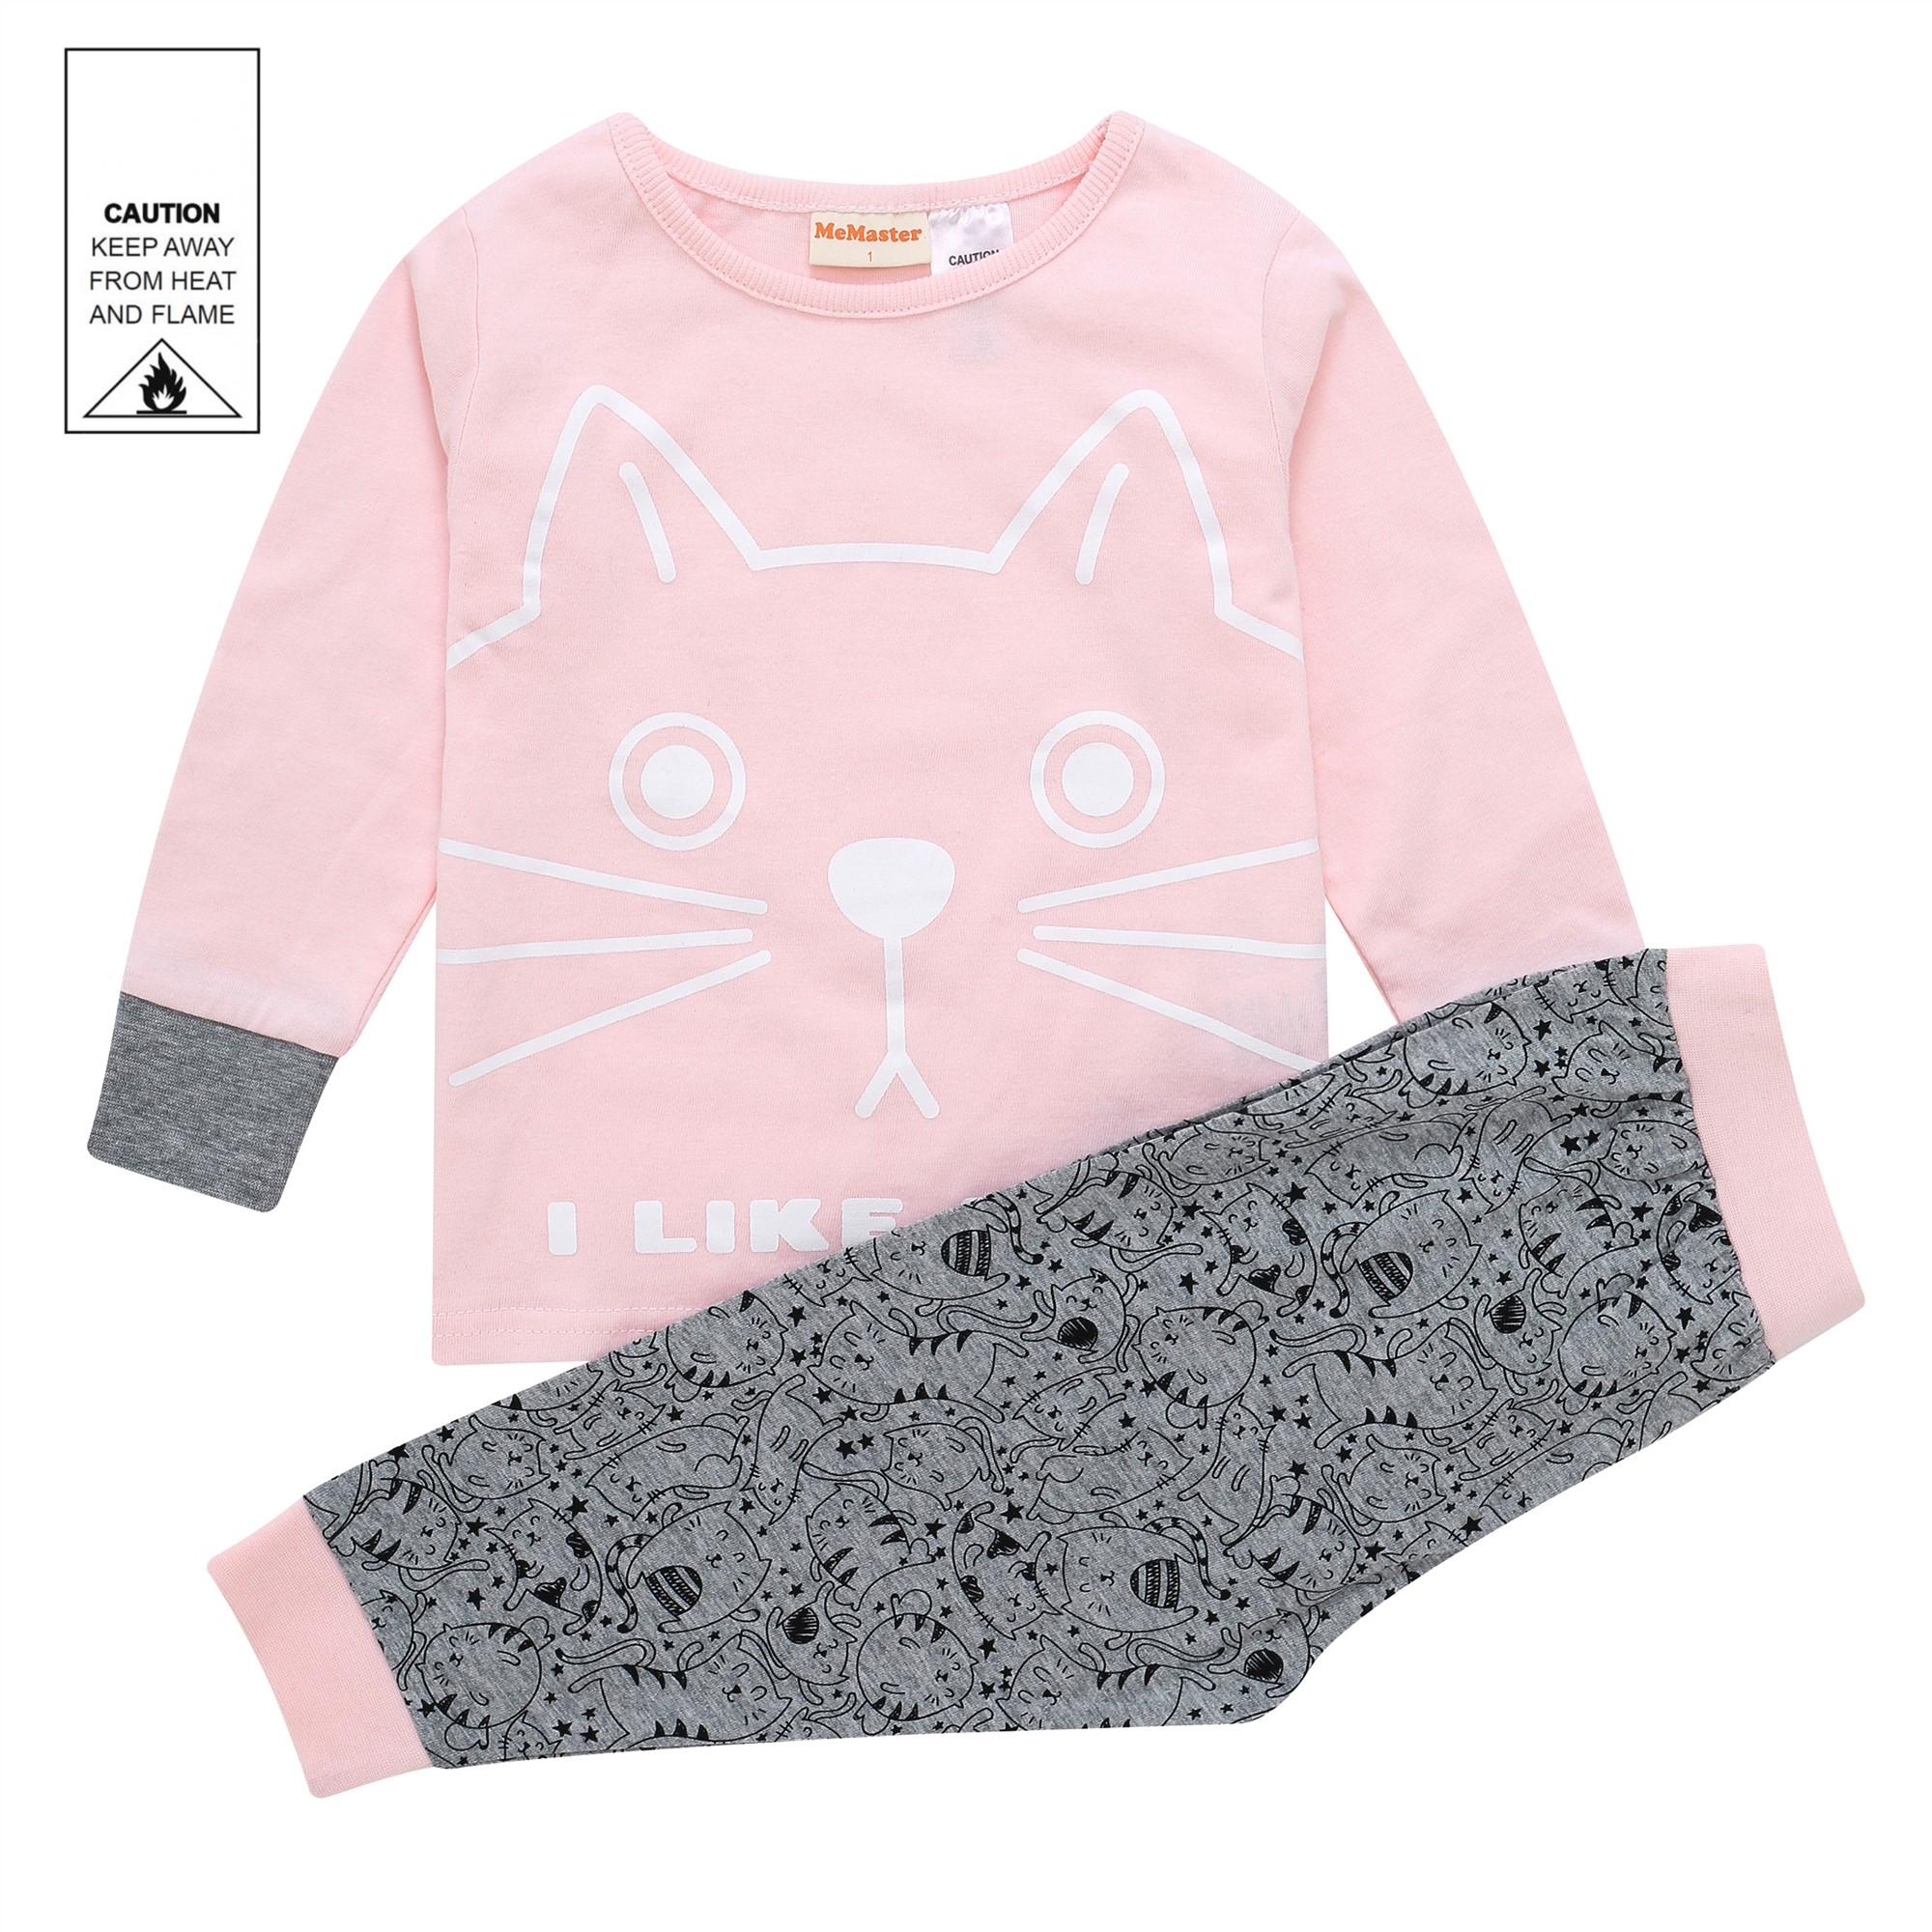 AW1921 Baby Girls Cat Pyjama Set - Pink